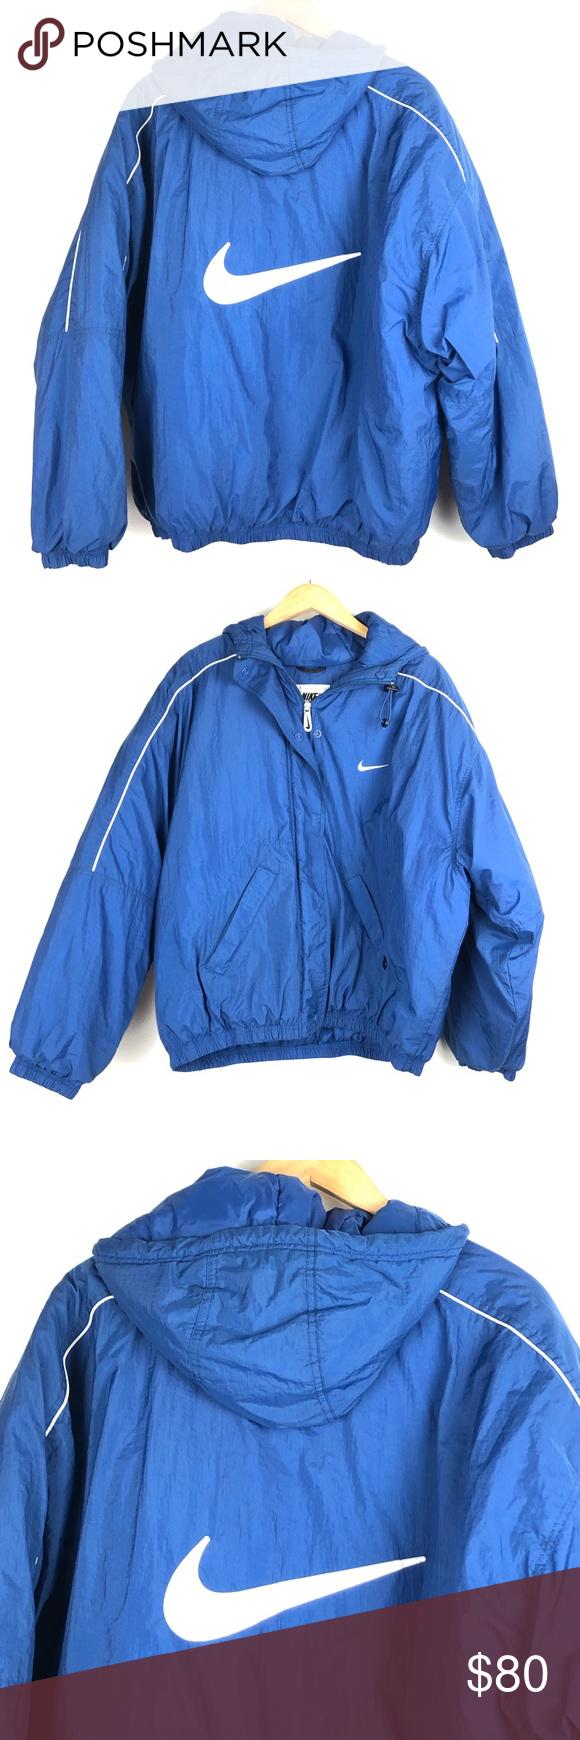 Vintage Nike Jacket Xl Blue Big Swoosh Zip Up 0803 Vintage Nike Jacket Vintage Nike Nike Jacket